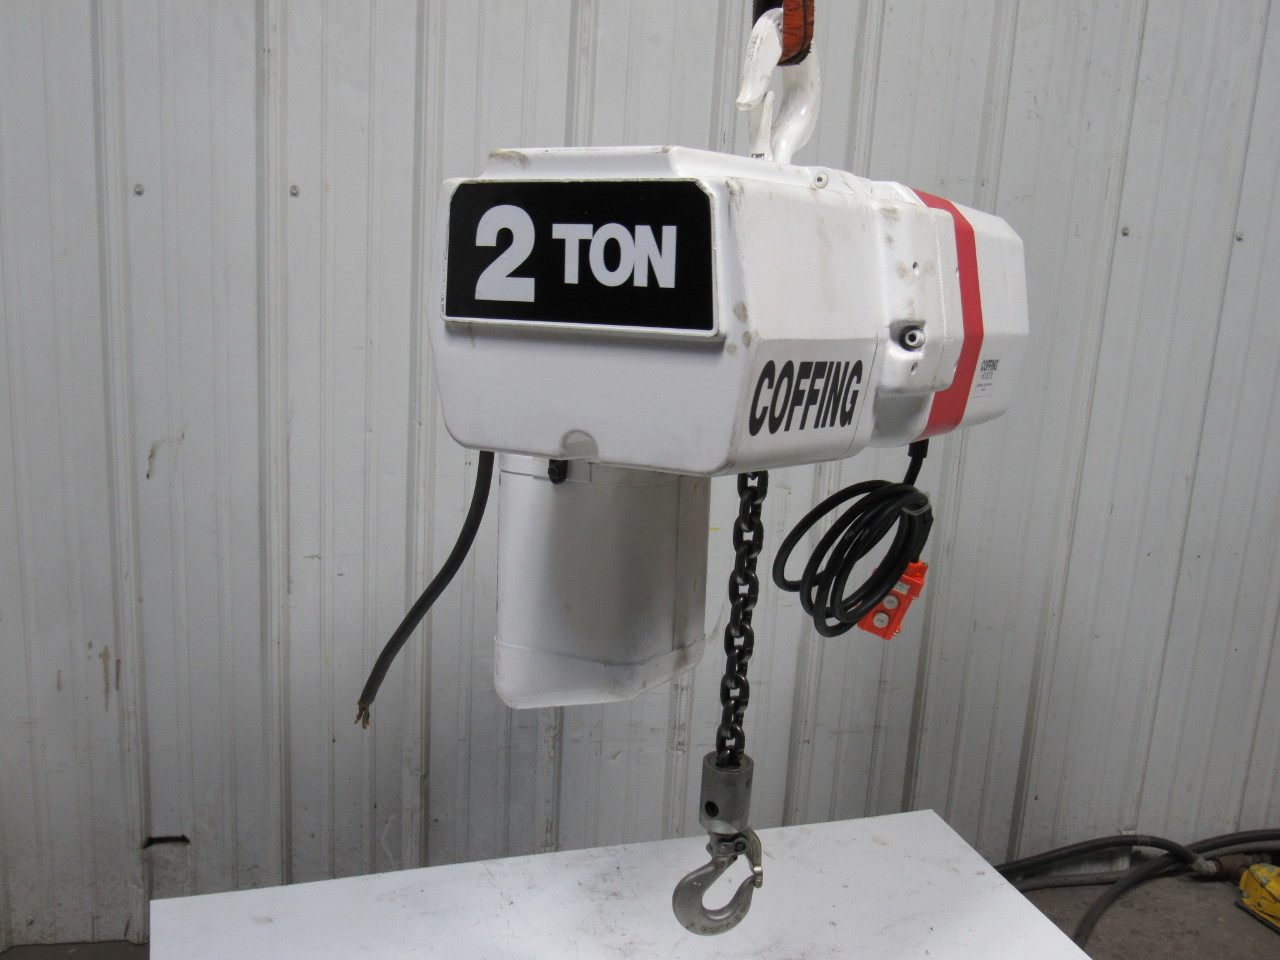 coffing 4024 3 2 ton electric chain hoist 12 39 lift 24fpm. Black Bedroom Furniture Sets. Home Design Ideas